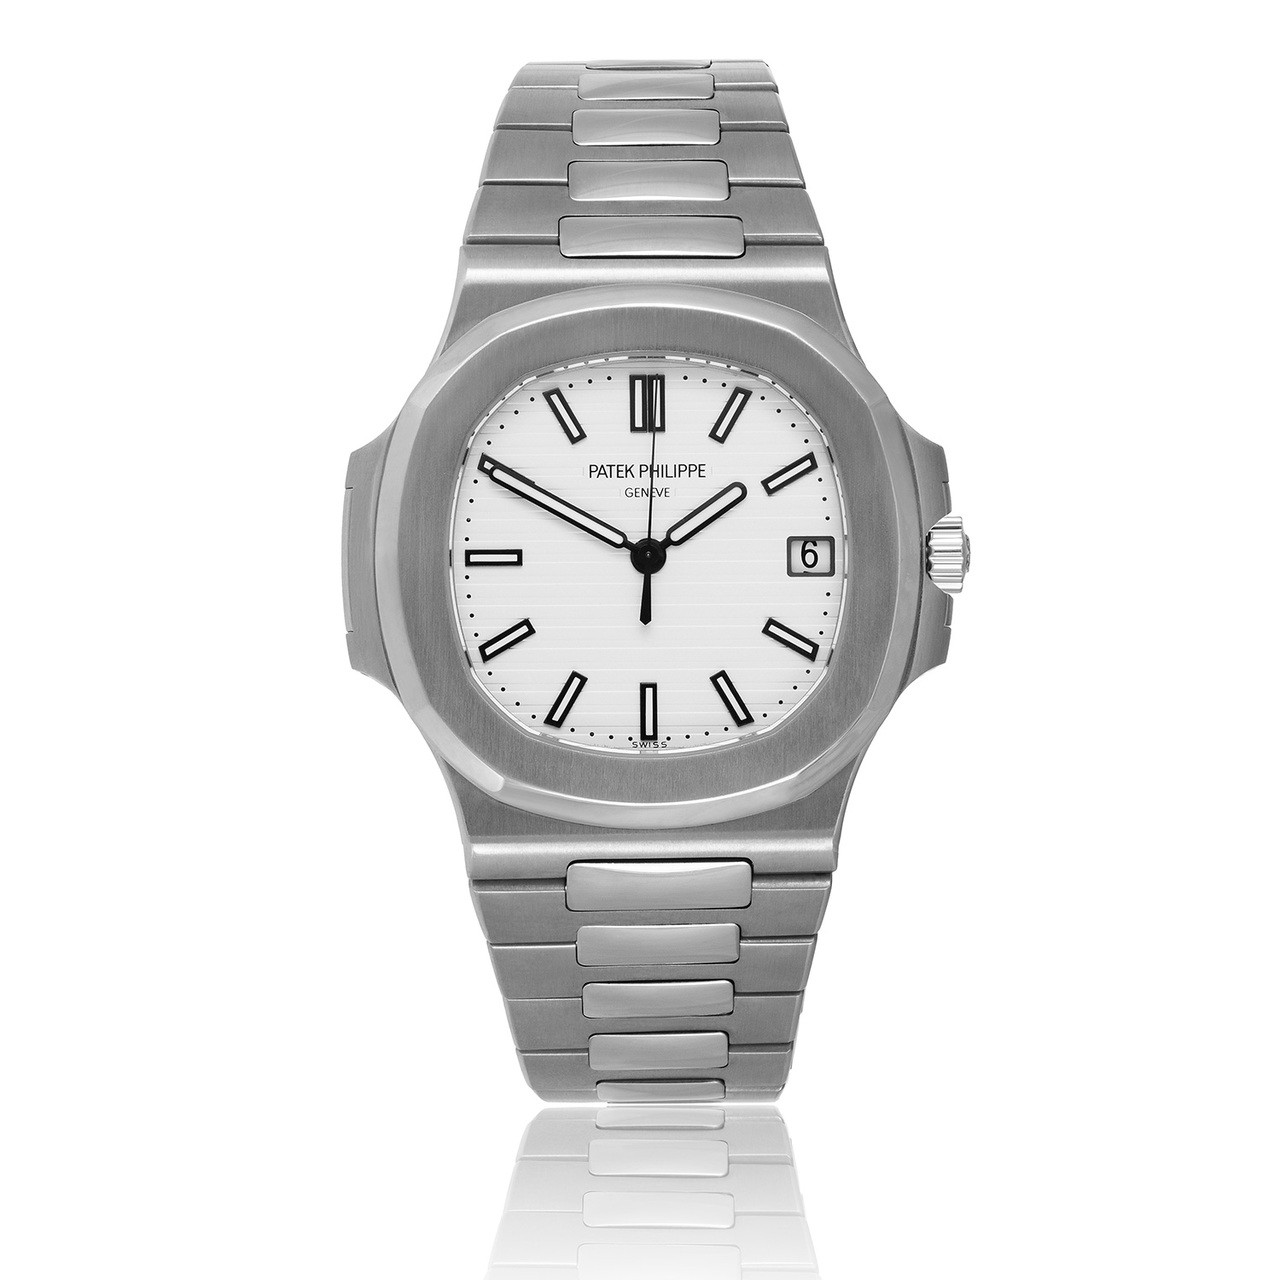 57111a Steel Watch Nautilus Stainless Philippe Patek wOX8Pn0k